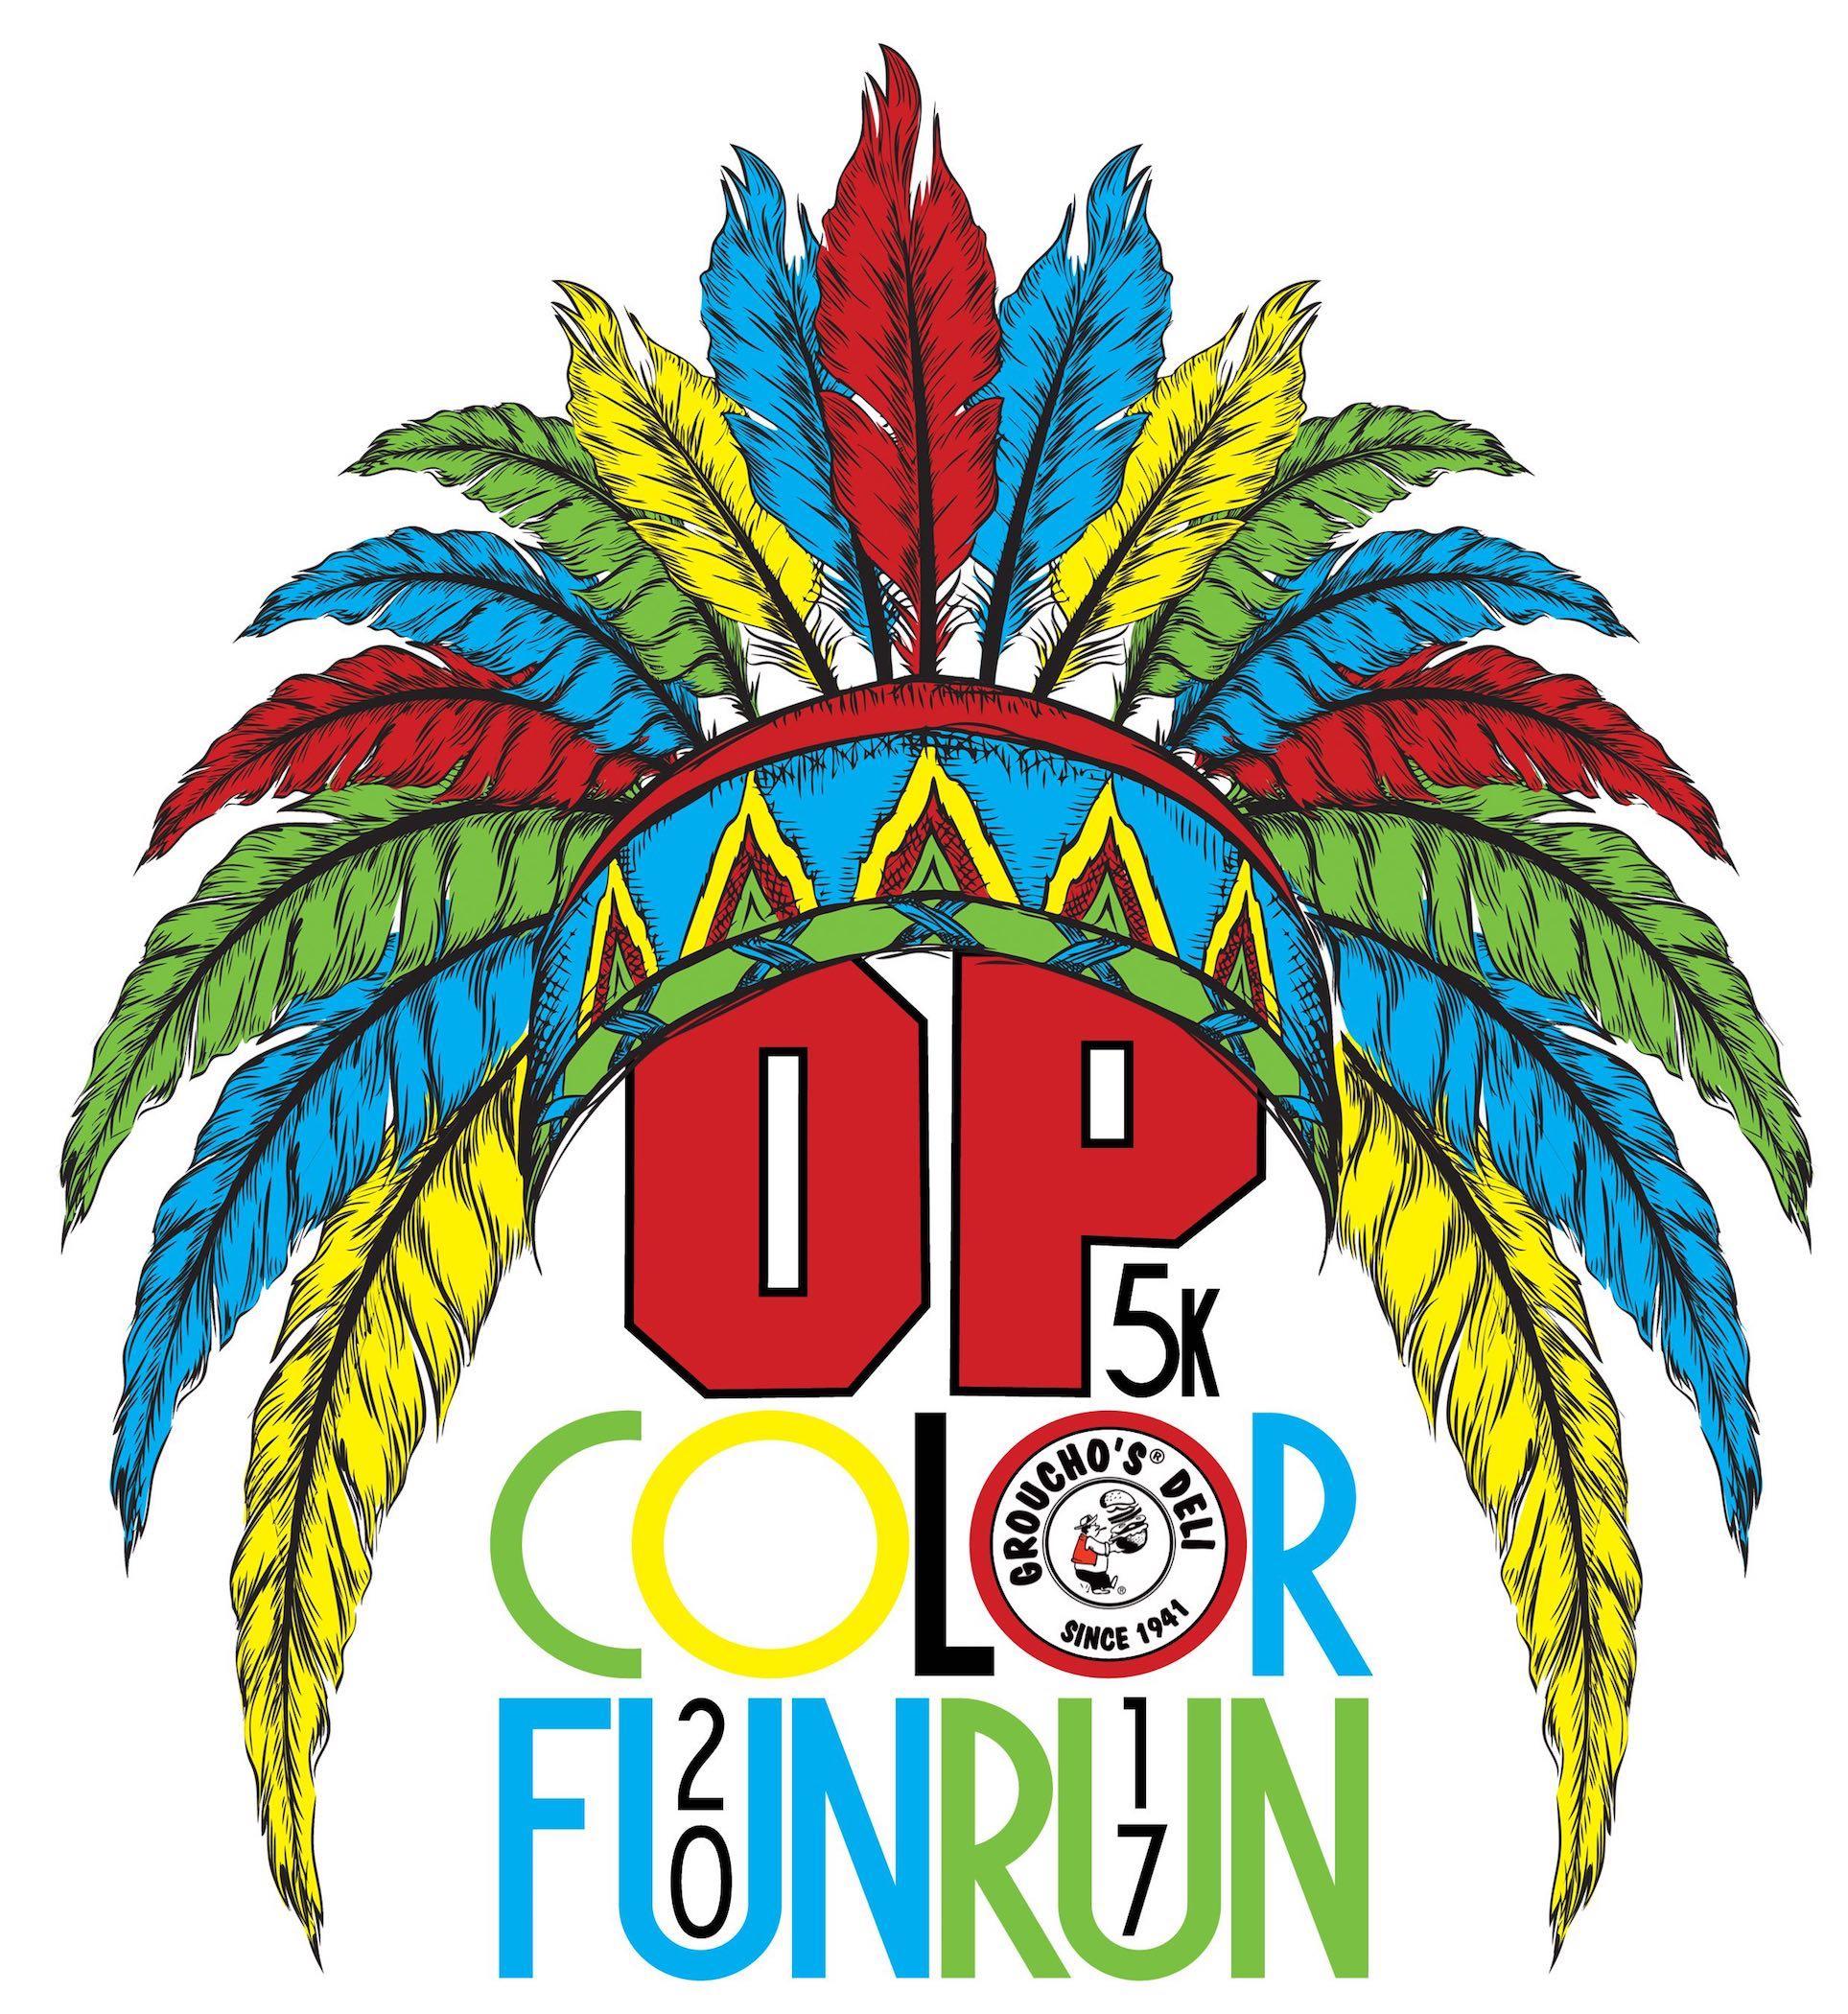 Ops 5k Color Fun Run Orangeburg Sc 2017 Active